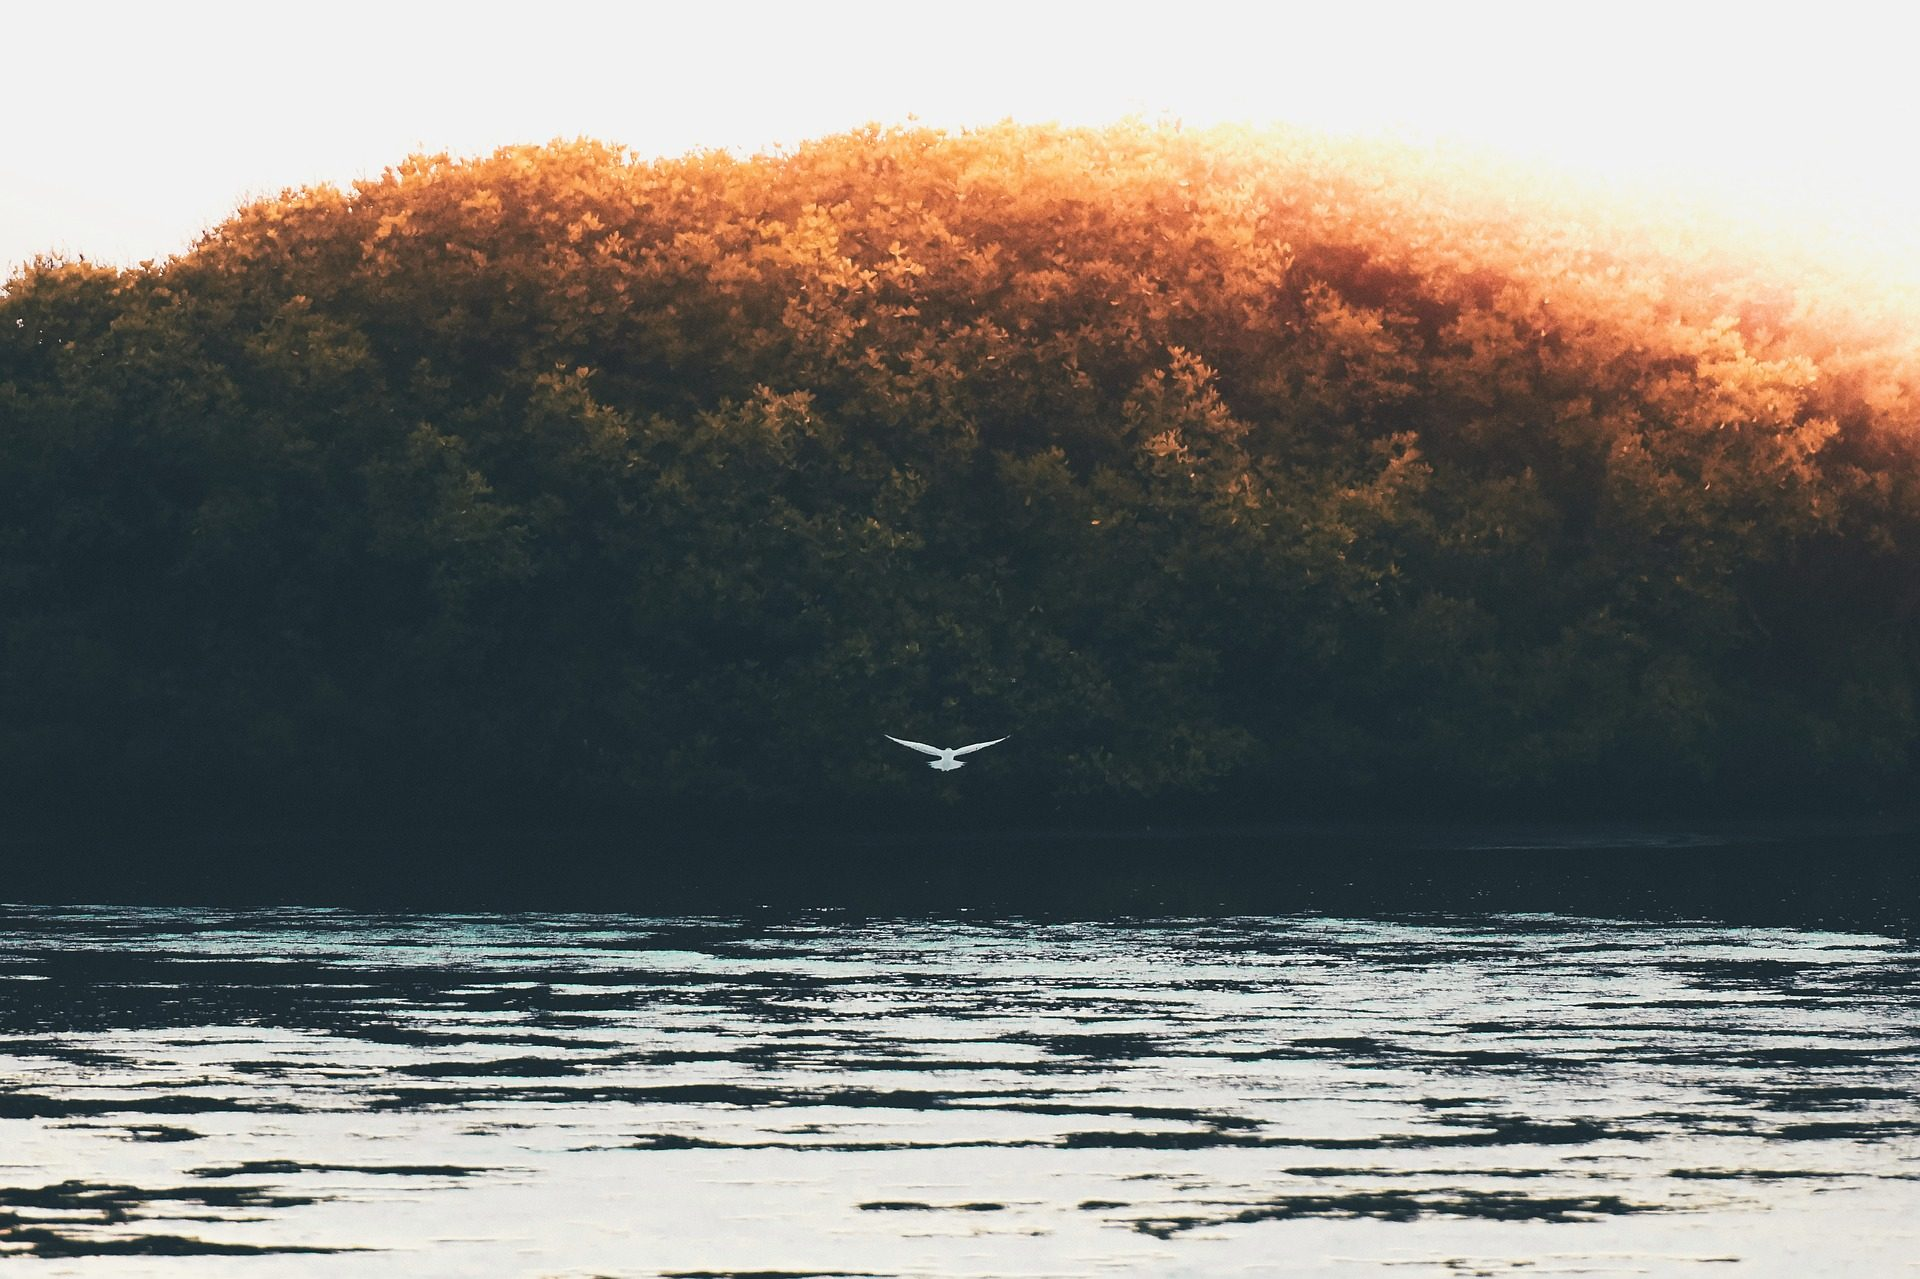 Lago, Rio, árvores, Pássaro, Ave, voo - Papéis de parede HD - Professor-falken.com